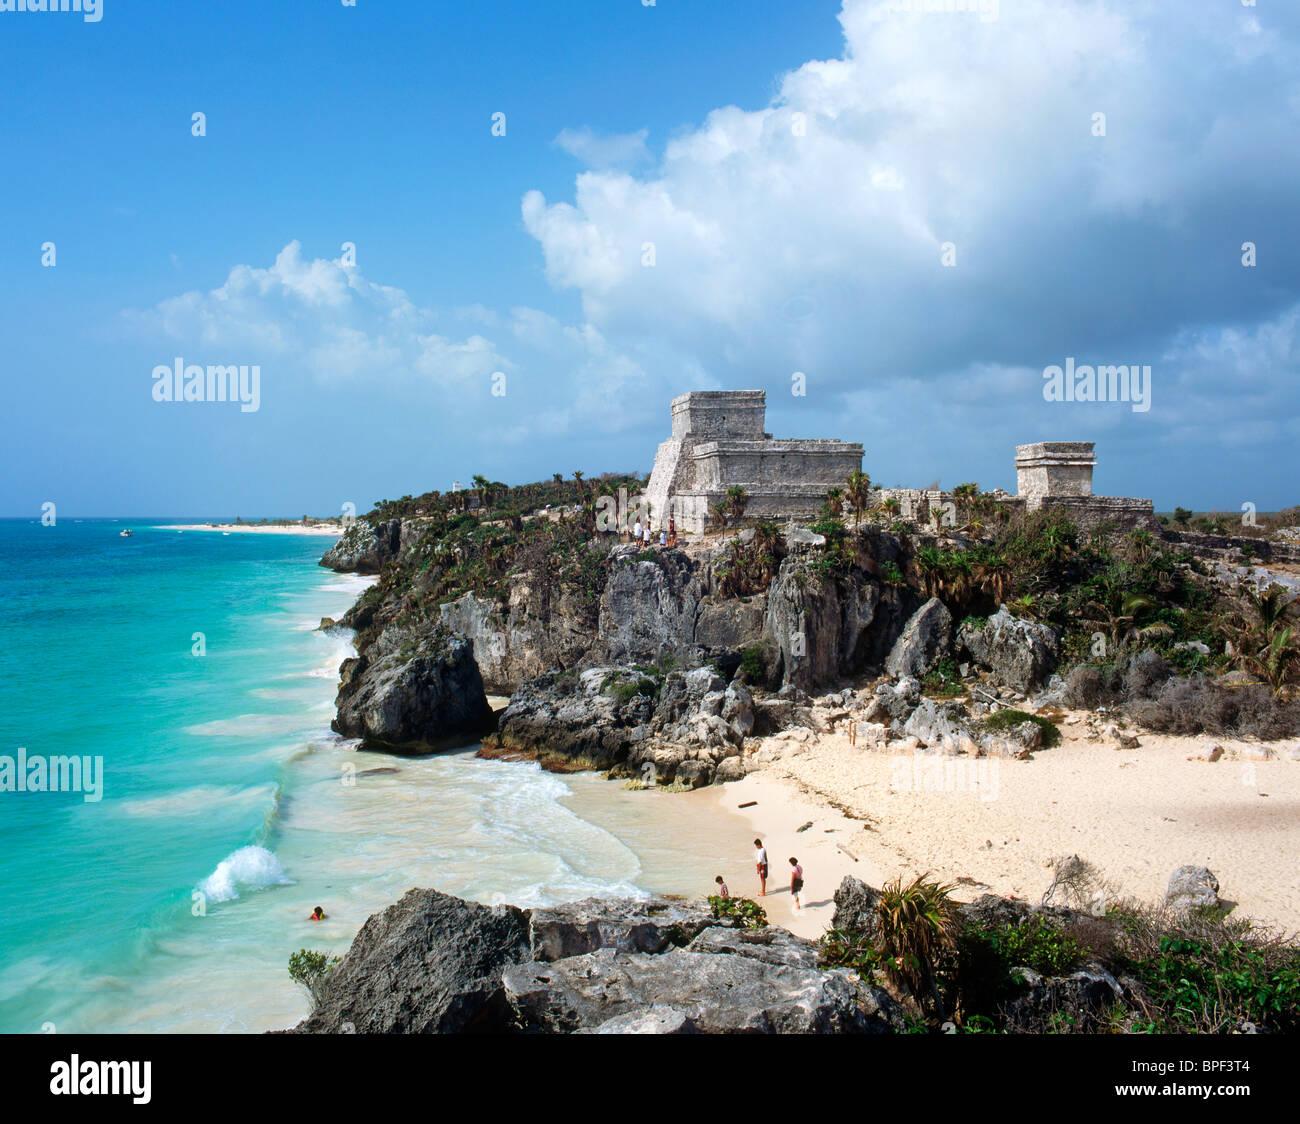 El Castillo Mayan Ruins, Tulum, Quintana Roo, Yucatan Peninsula, Mexico - Stock Image